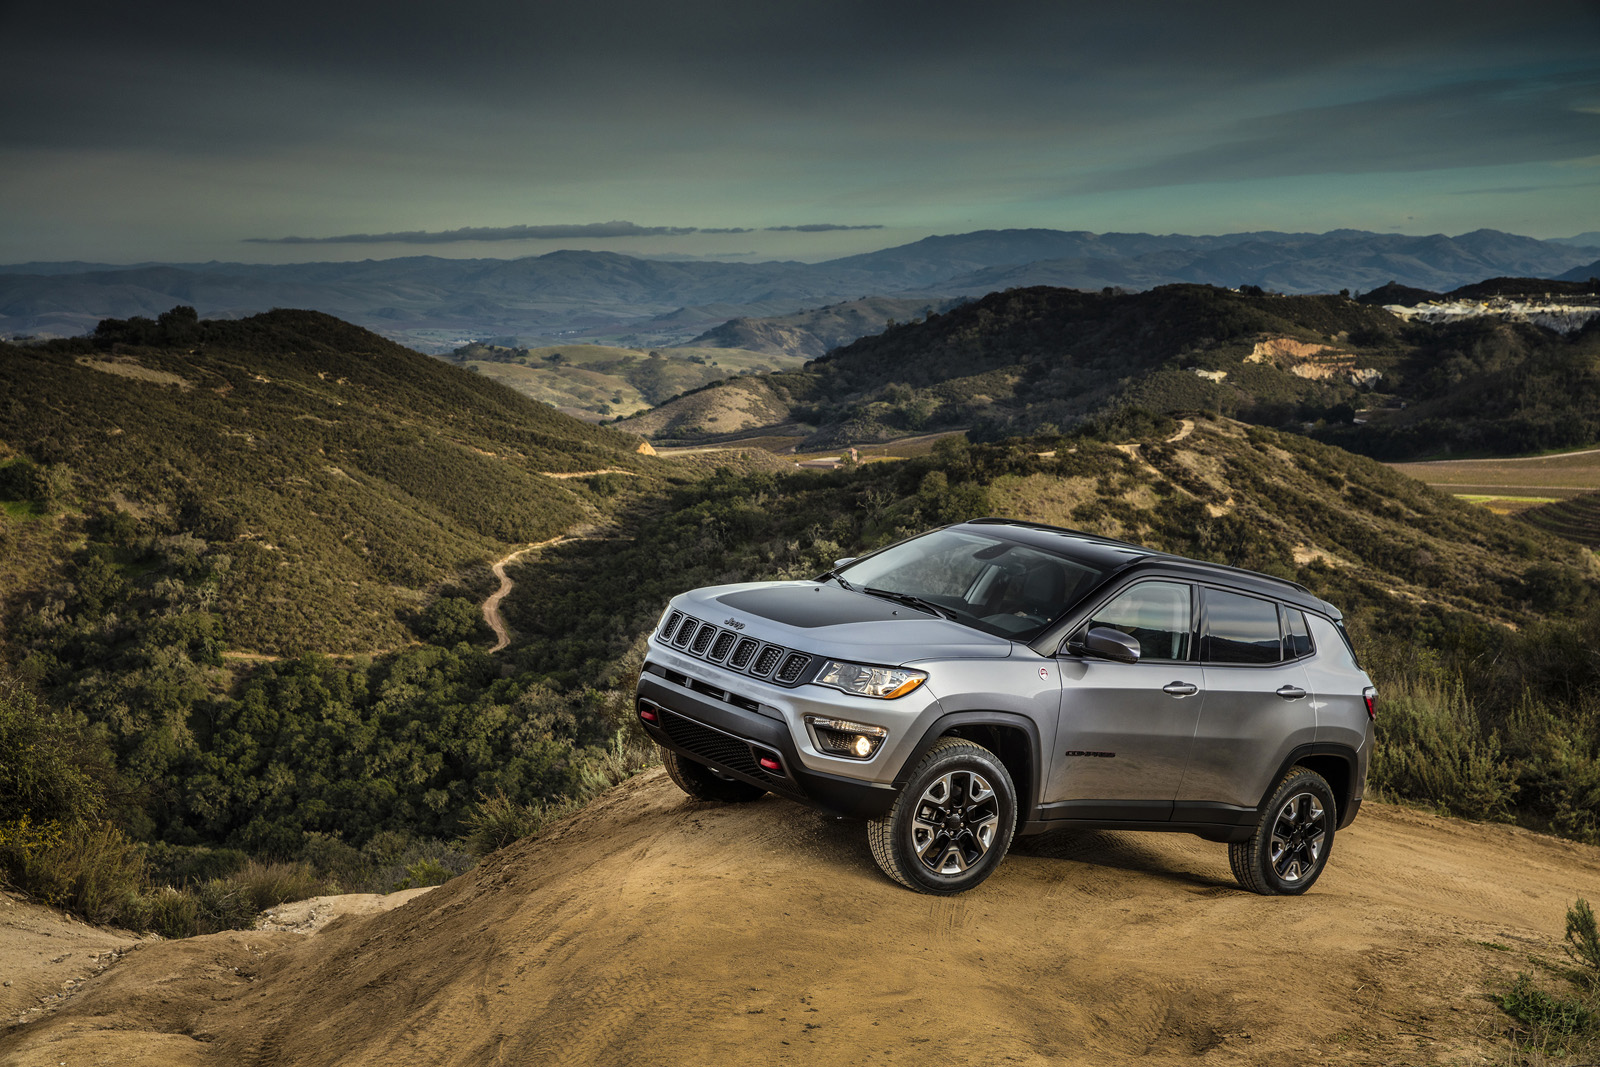 2020 Jeep® Compass Trailhawk